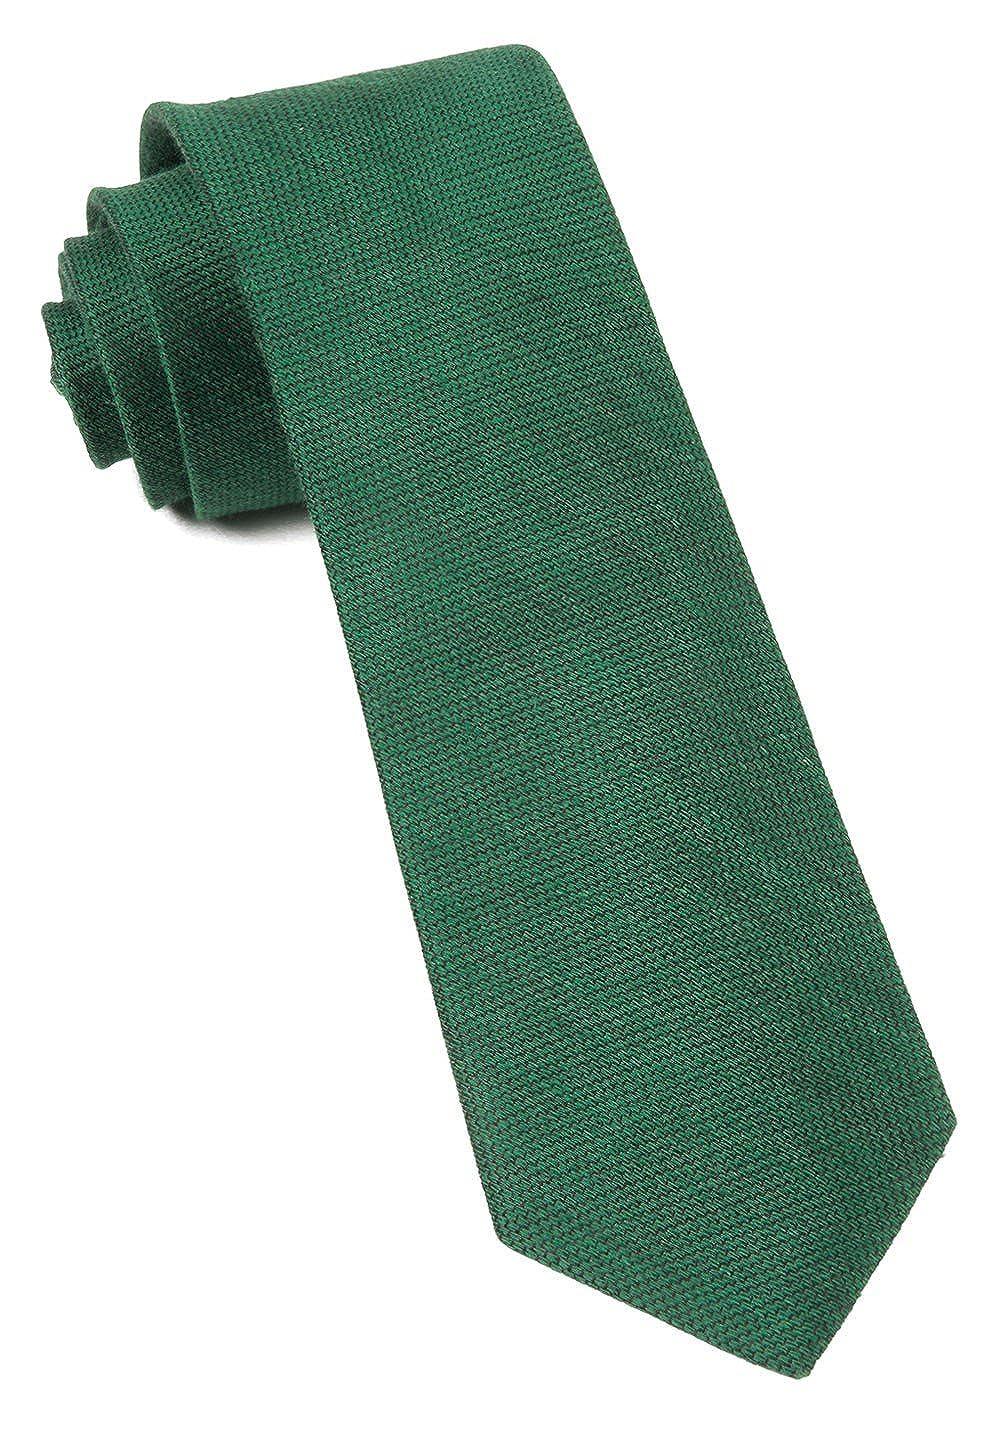 The Tie Bar Linen Blend Jet Set Solid Emerald Green 2.5 Inch Tie